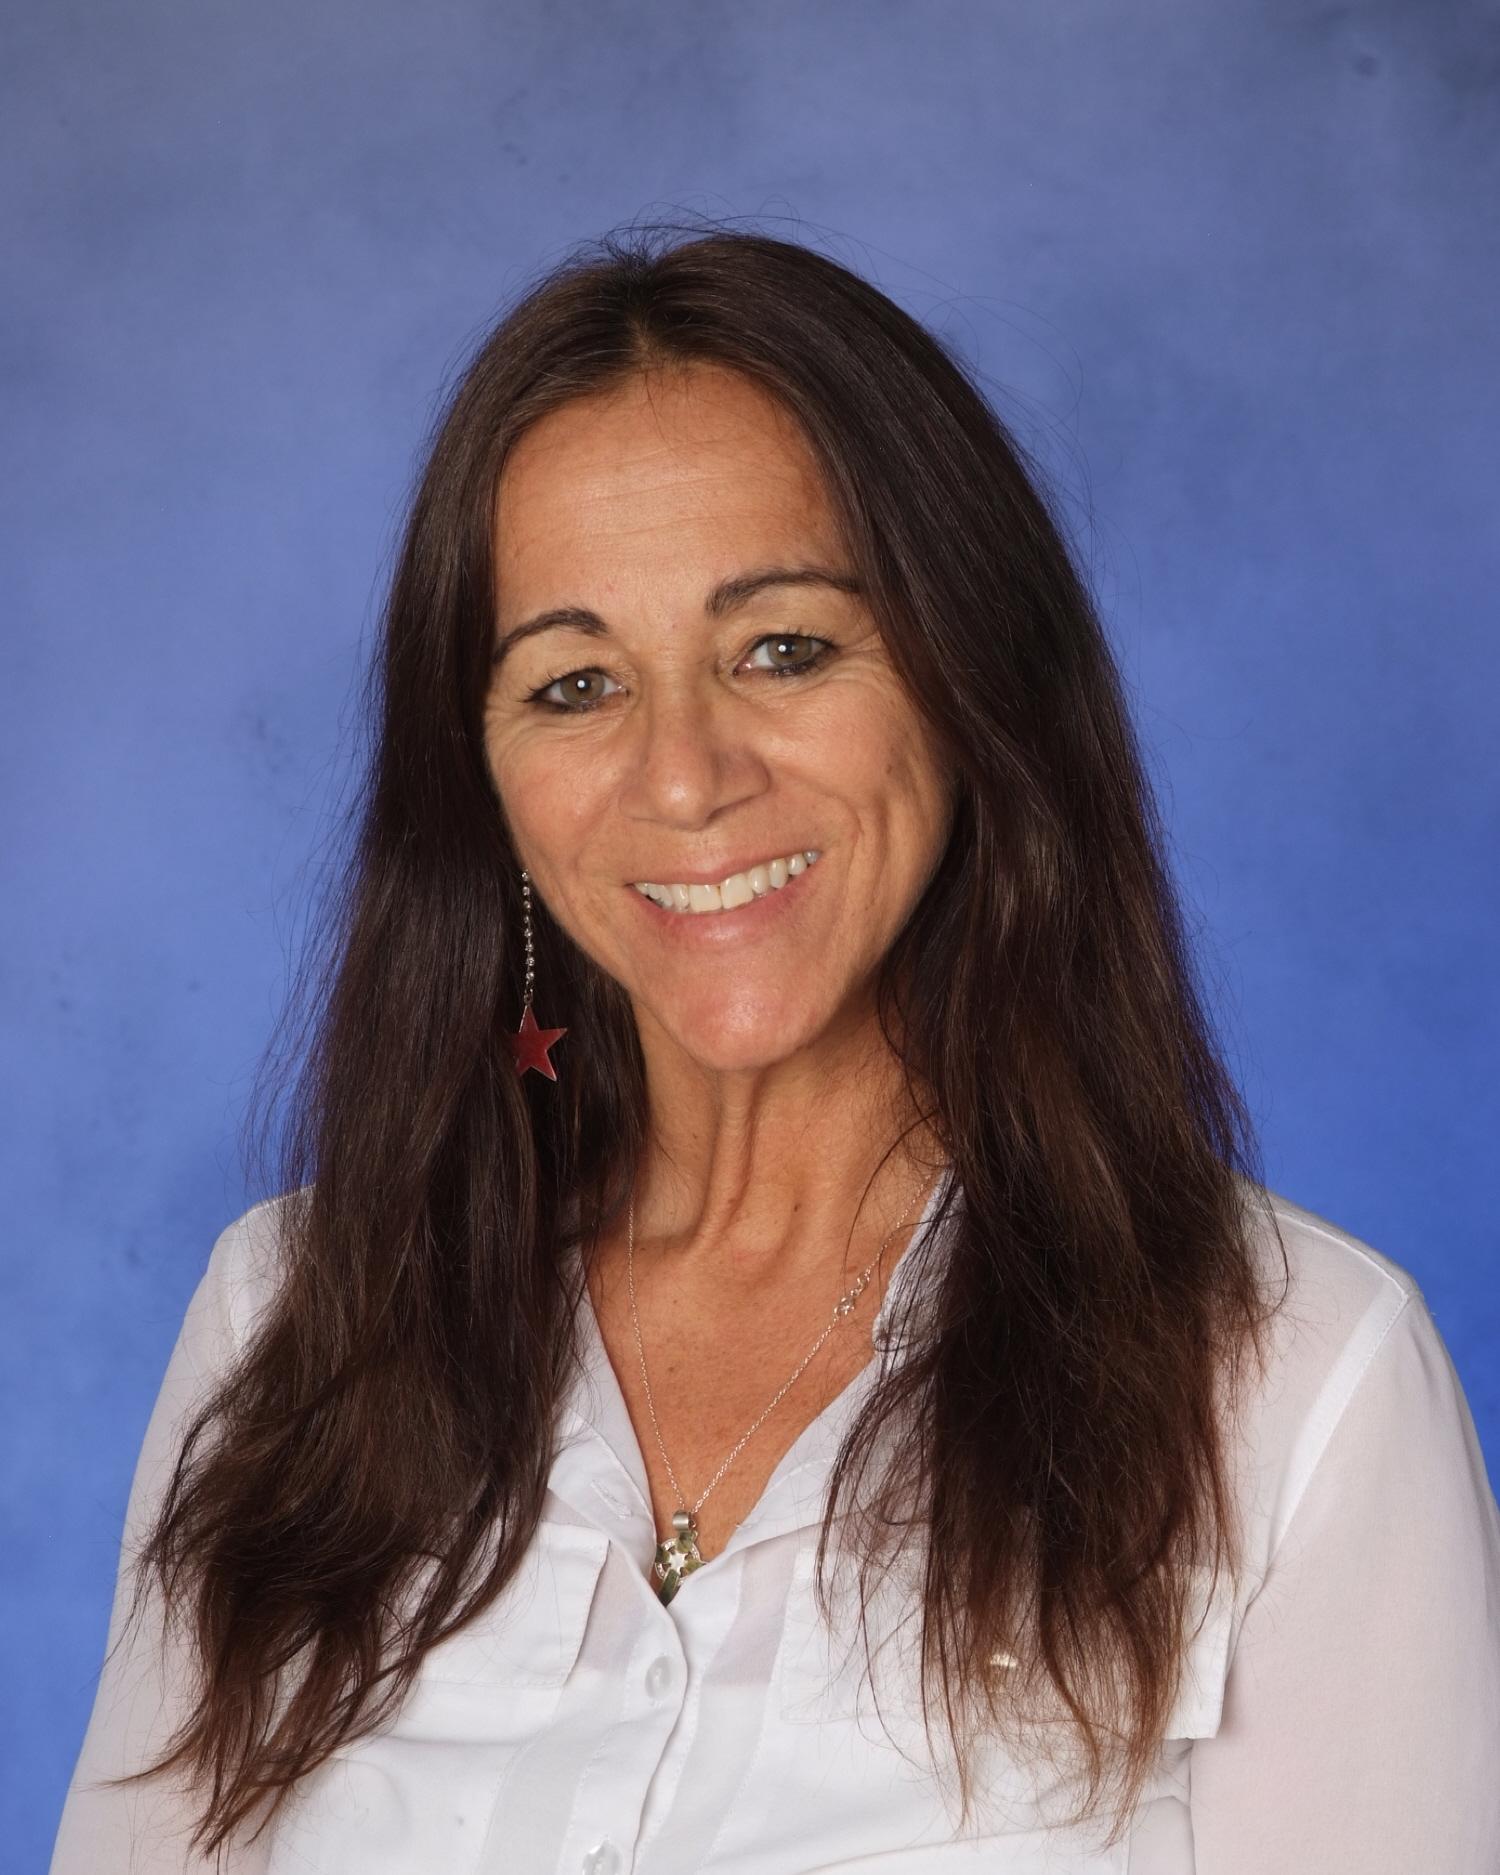 Kathy DeArellano